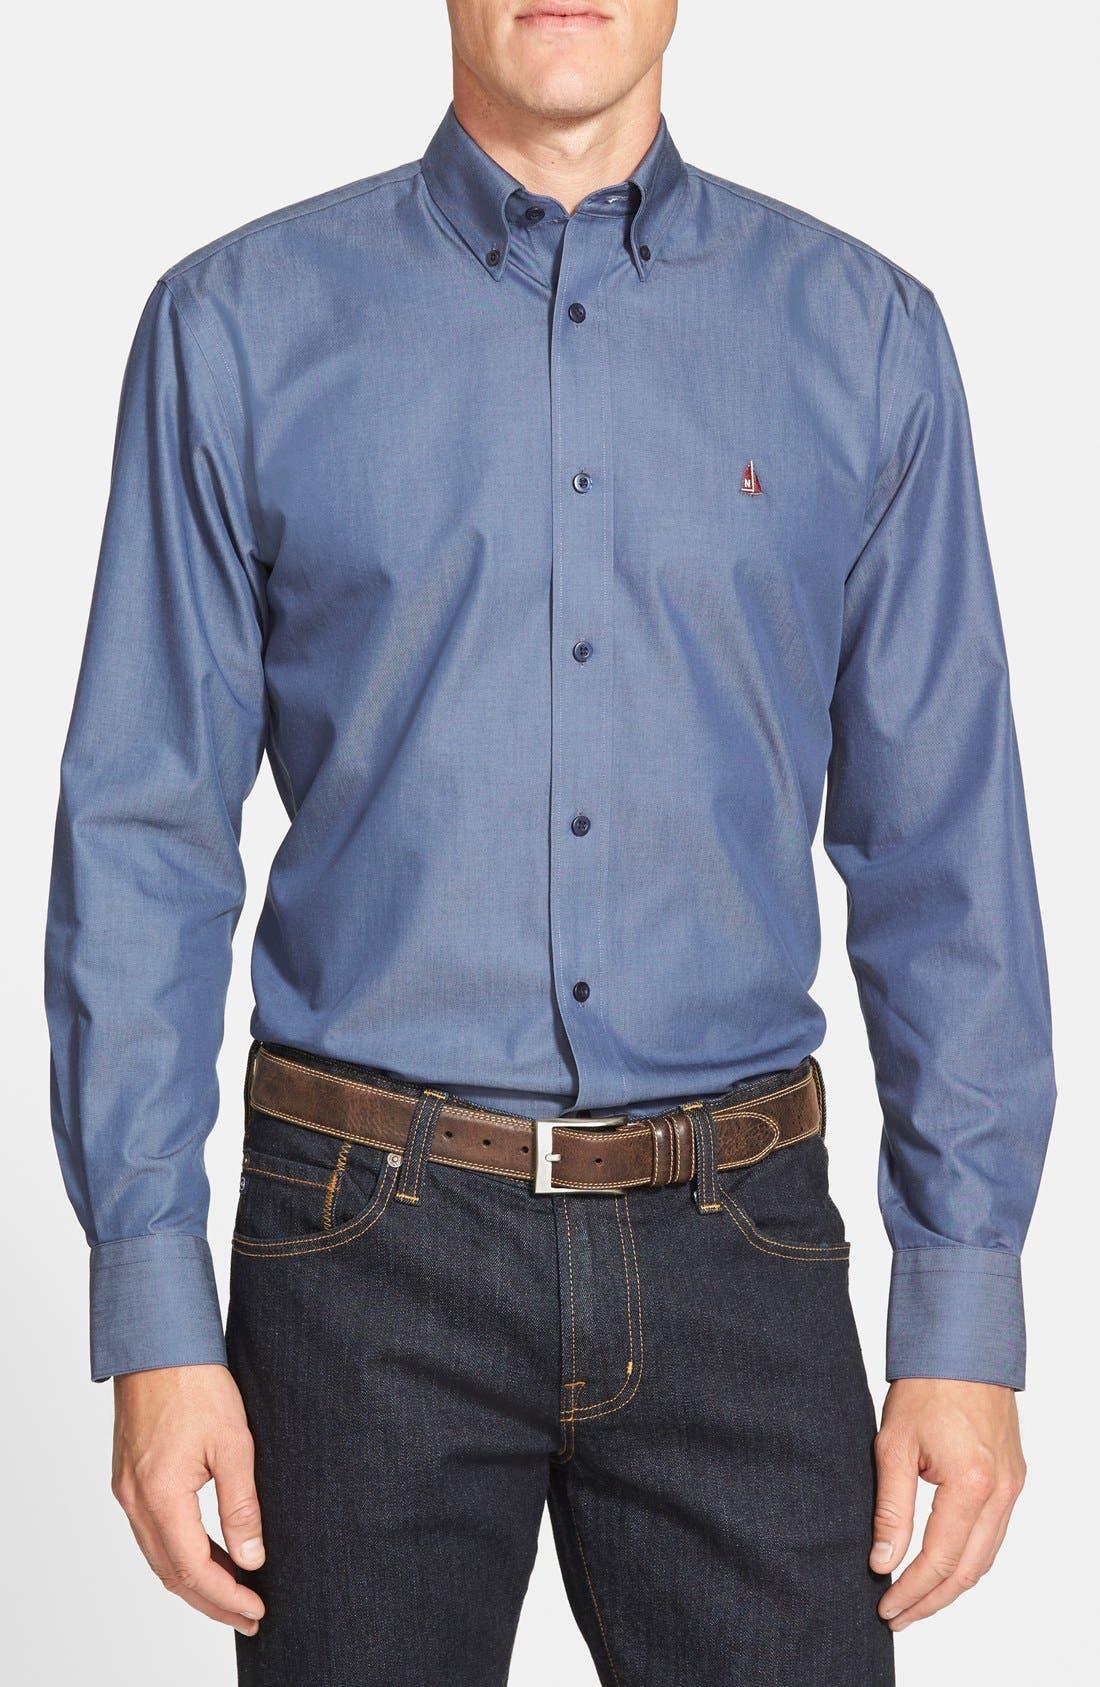 Alternate Image 1 Selected - Nordstrom Men's Shop Smartcare™ Regular Fit Twill Denim Boat Shirt (Regular & Tall)